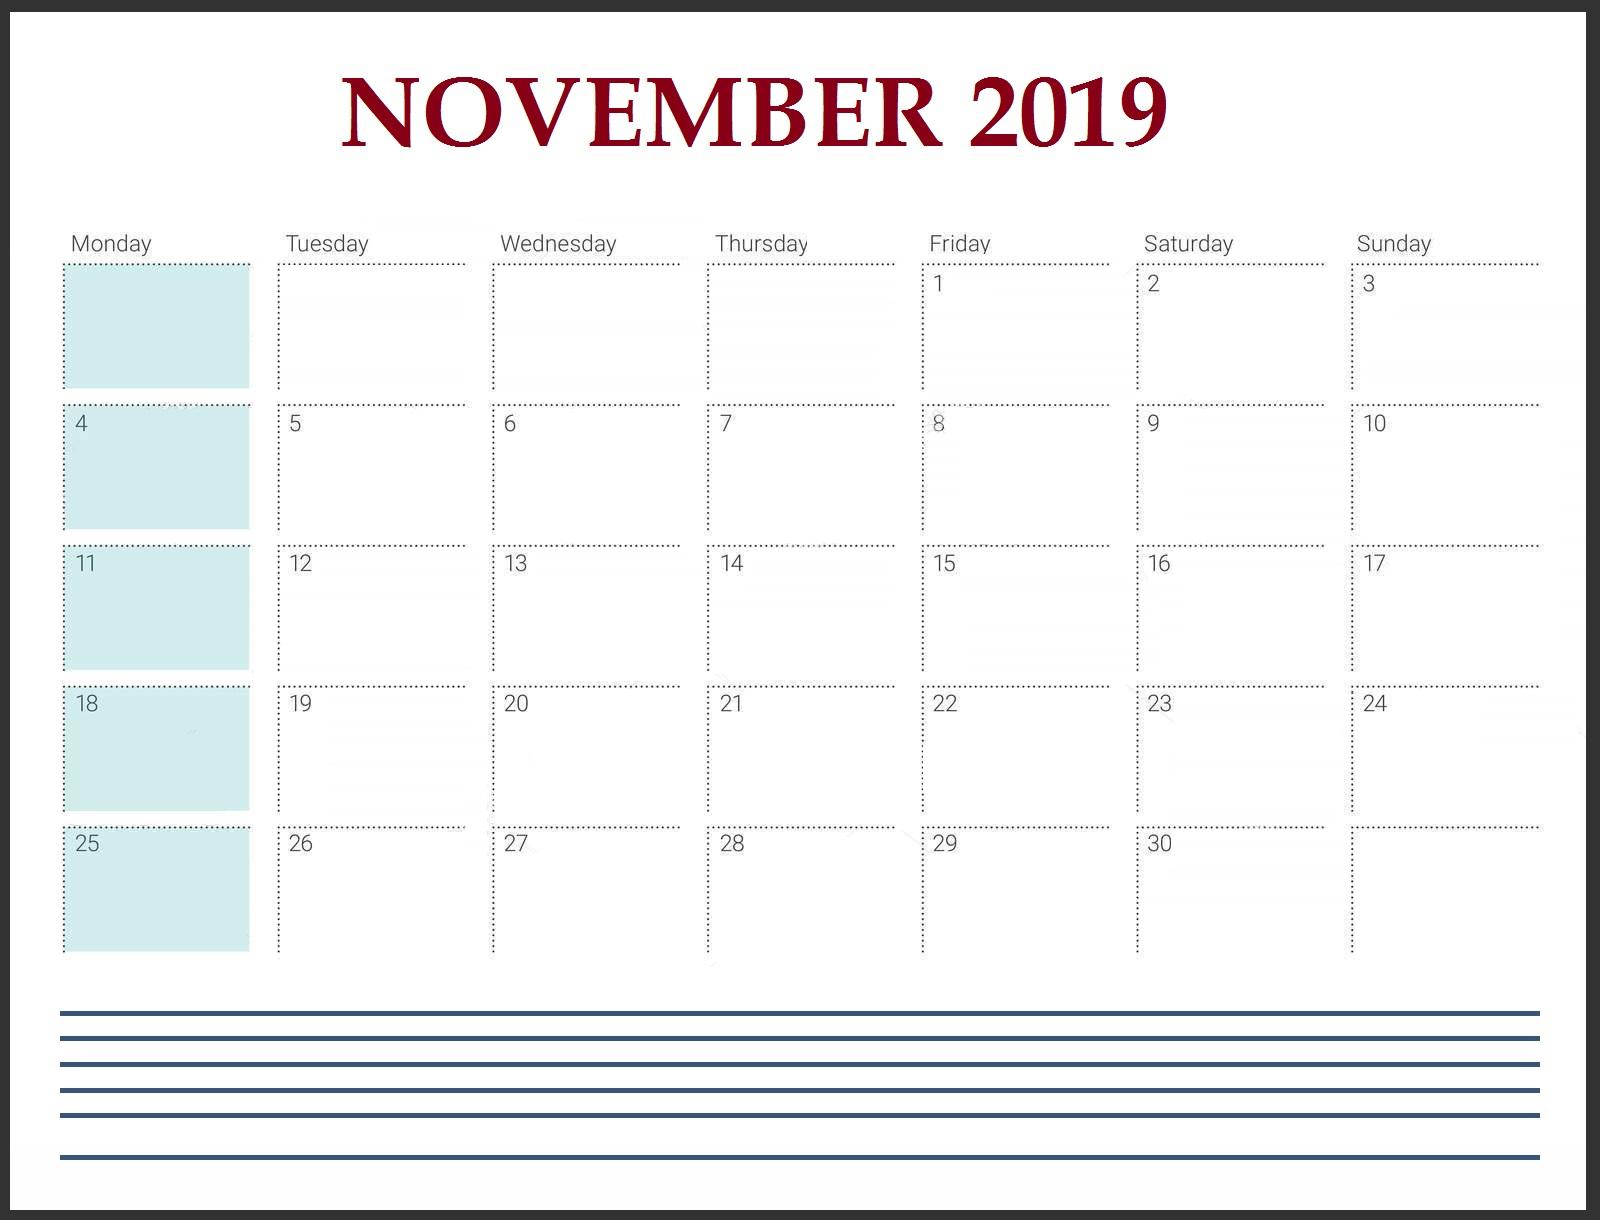 Cute November 2019 Desk Calendar